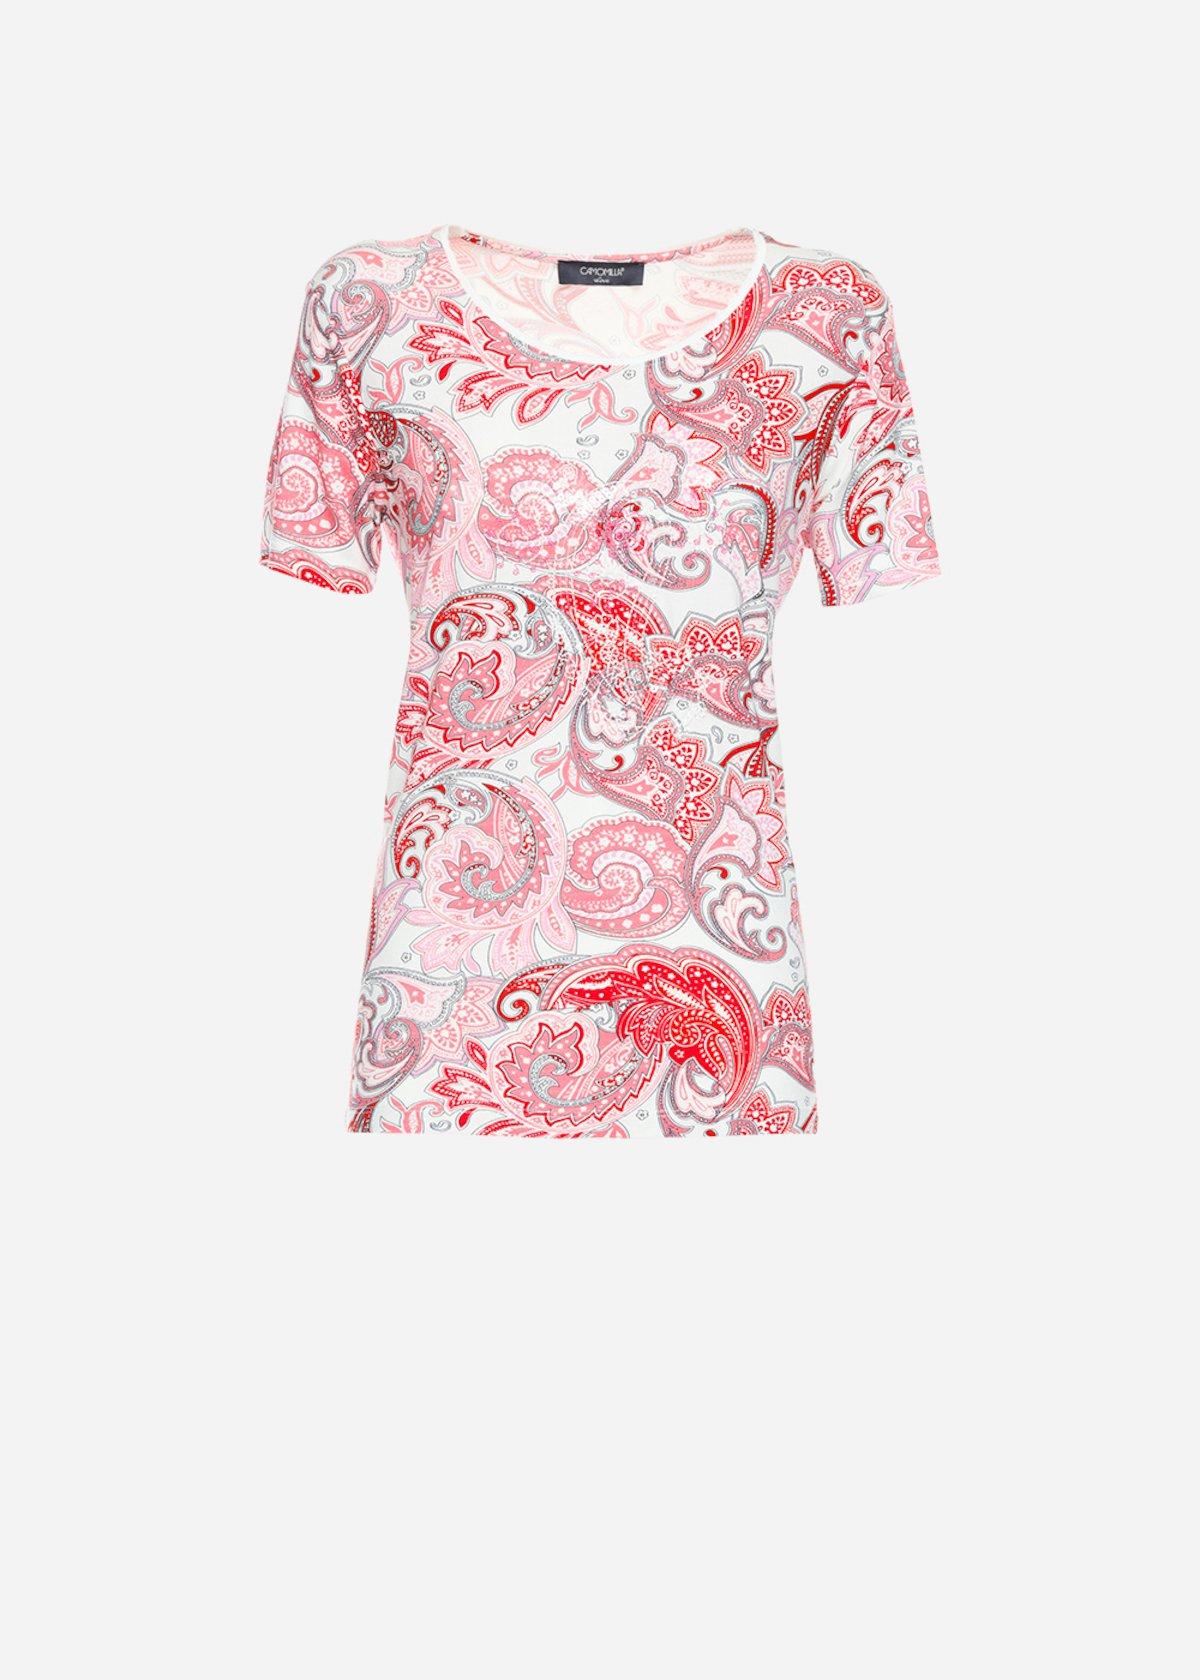 Surya round neck and embroidery t-shirt - Fuxia / White Fantasia